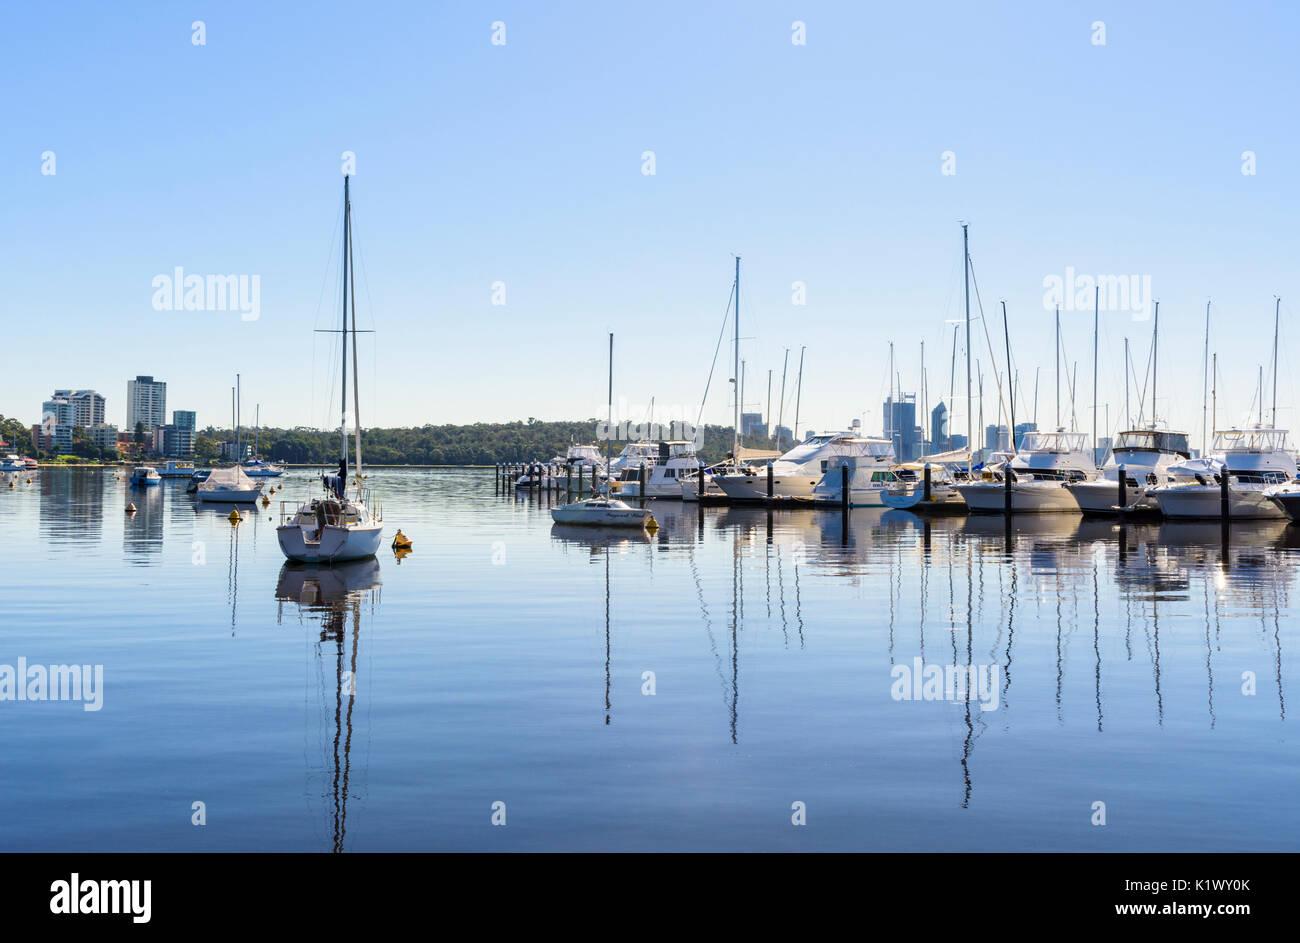 Boats moored at Royal Perth Yacht Club in Matilda Bay on the Swan River, Crawley, Perth, Western Australia Stock Photo